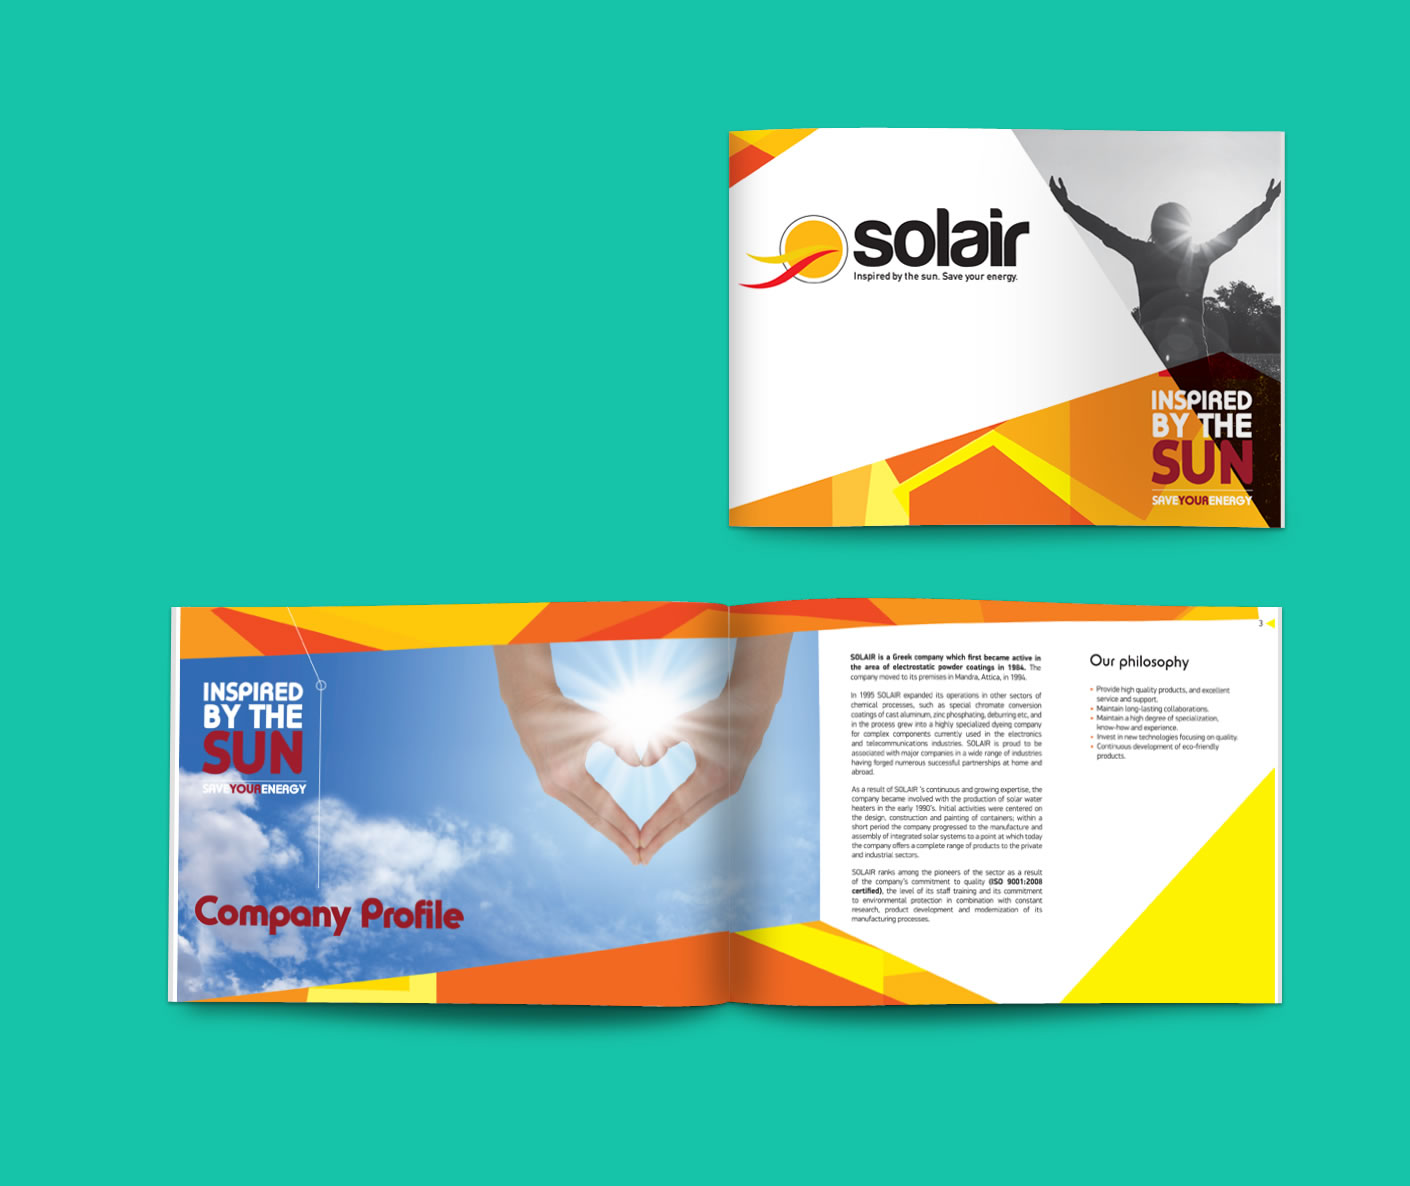 SOLAIR_COMPANY PROFILE